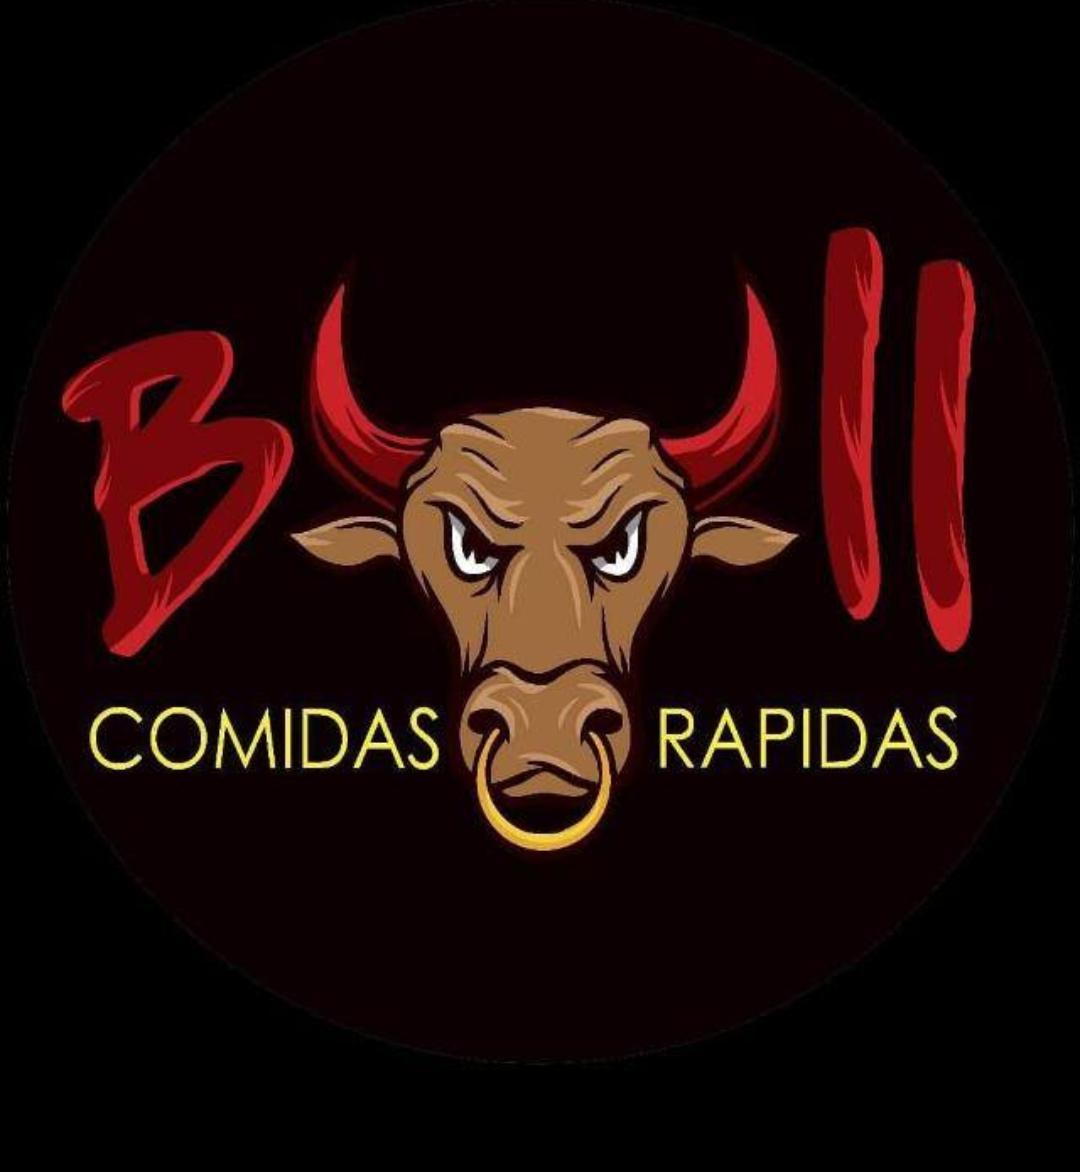 Bull Comidas Rápidas